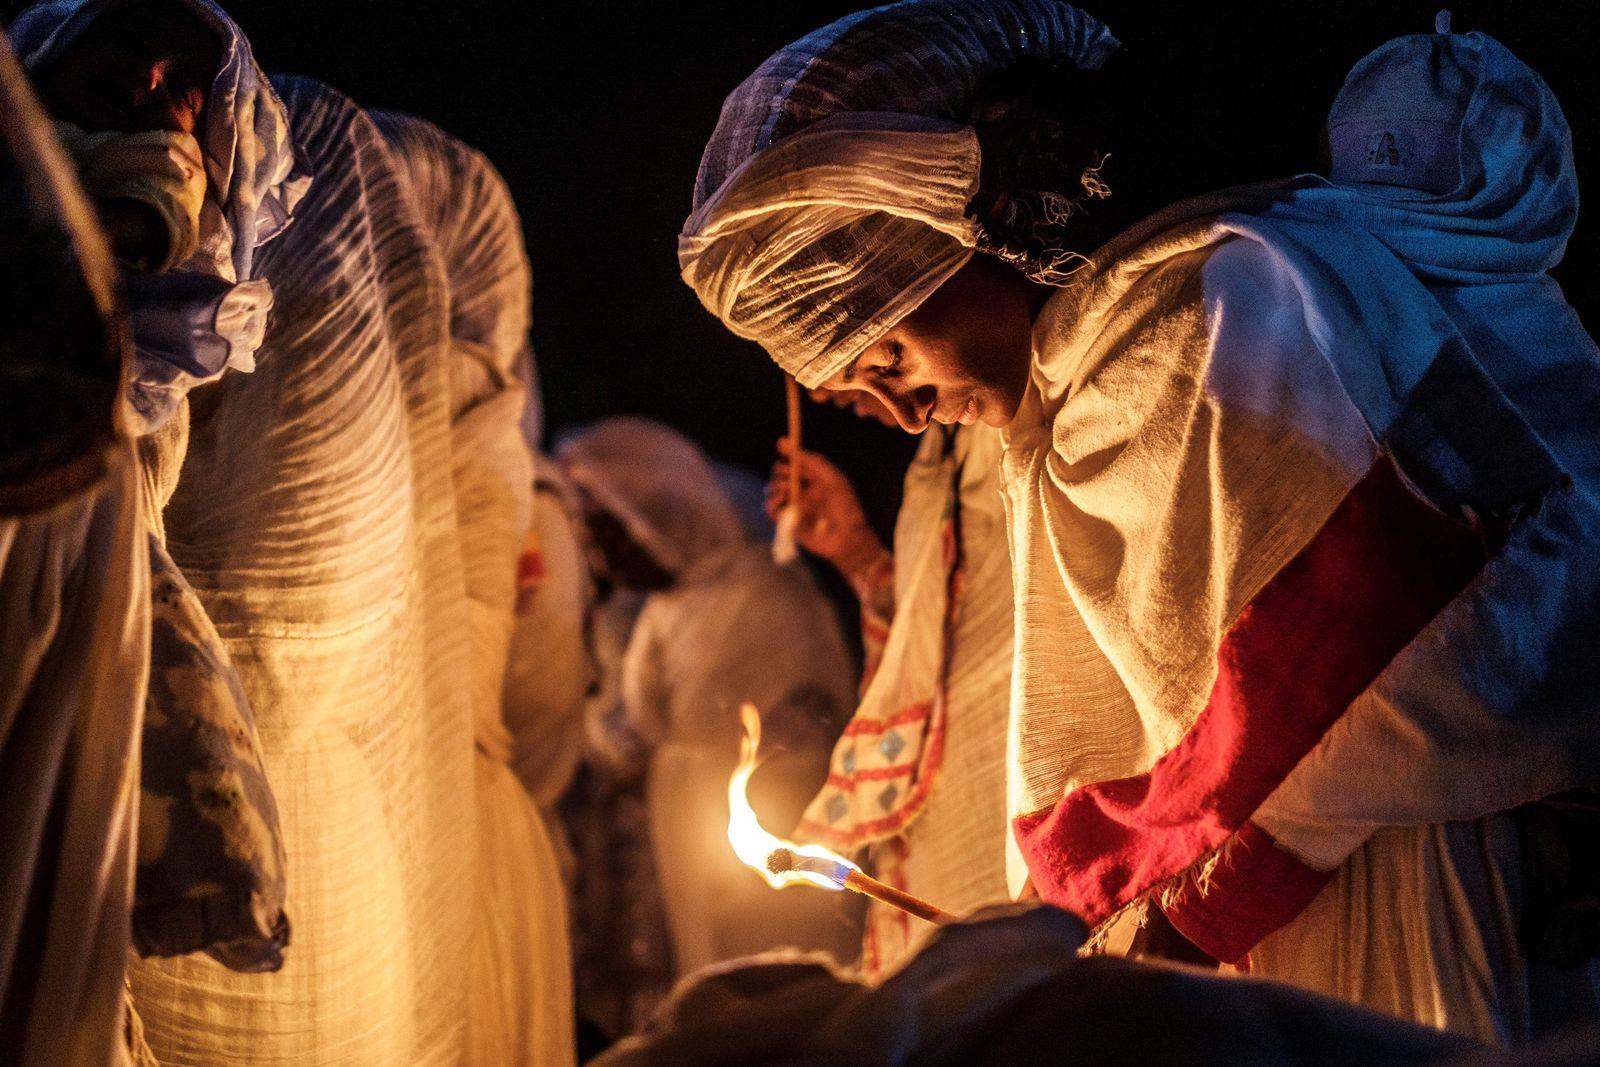 TOPSHOT-ETHIOPIA-RELIGION-ORTHODOX